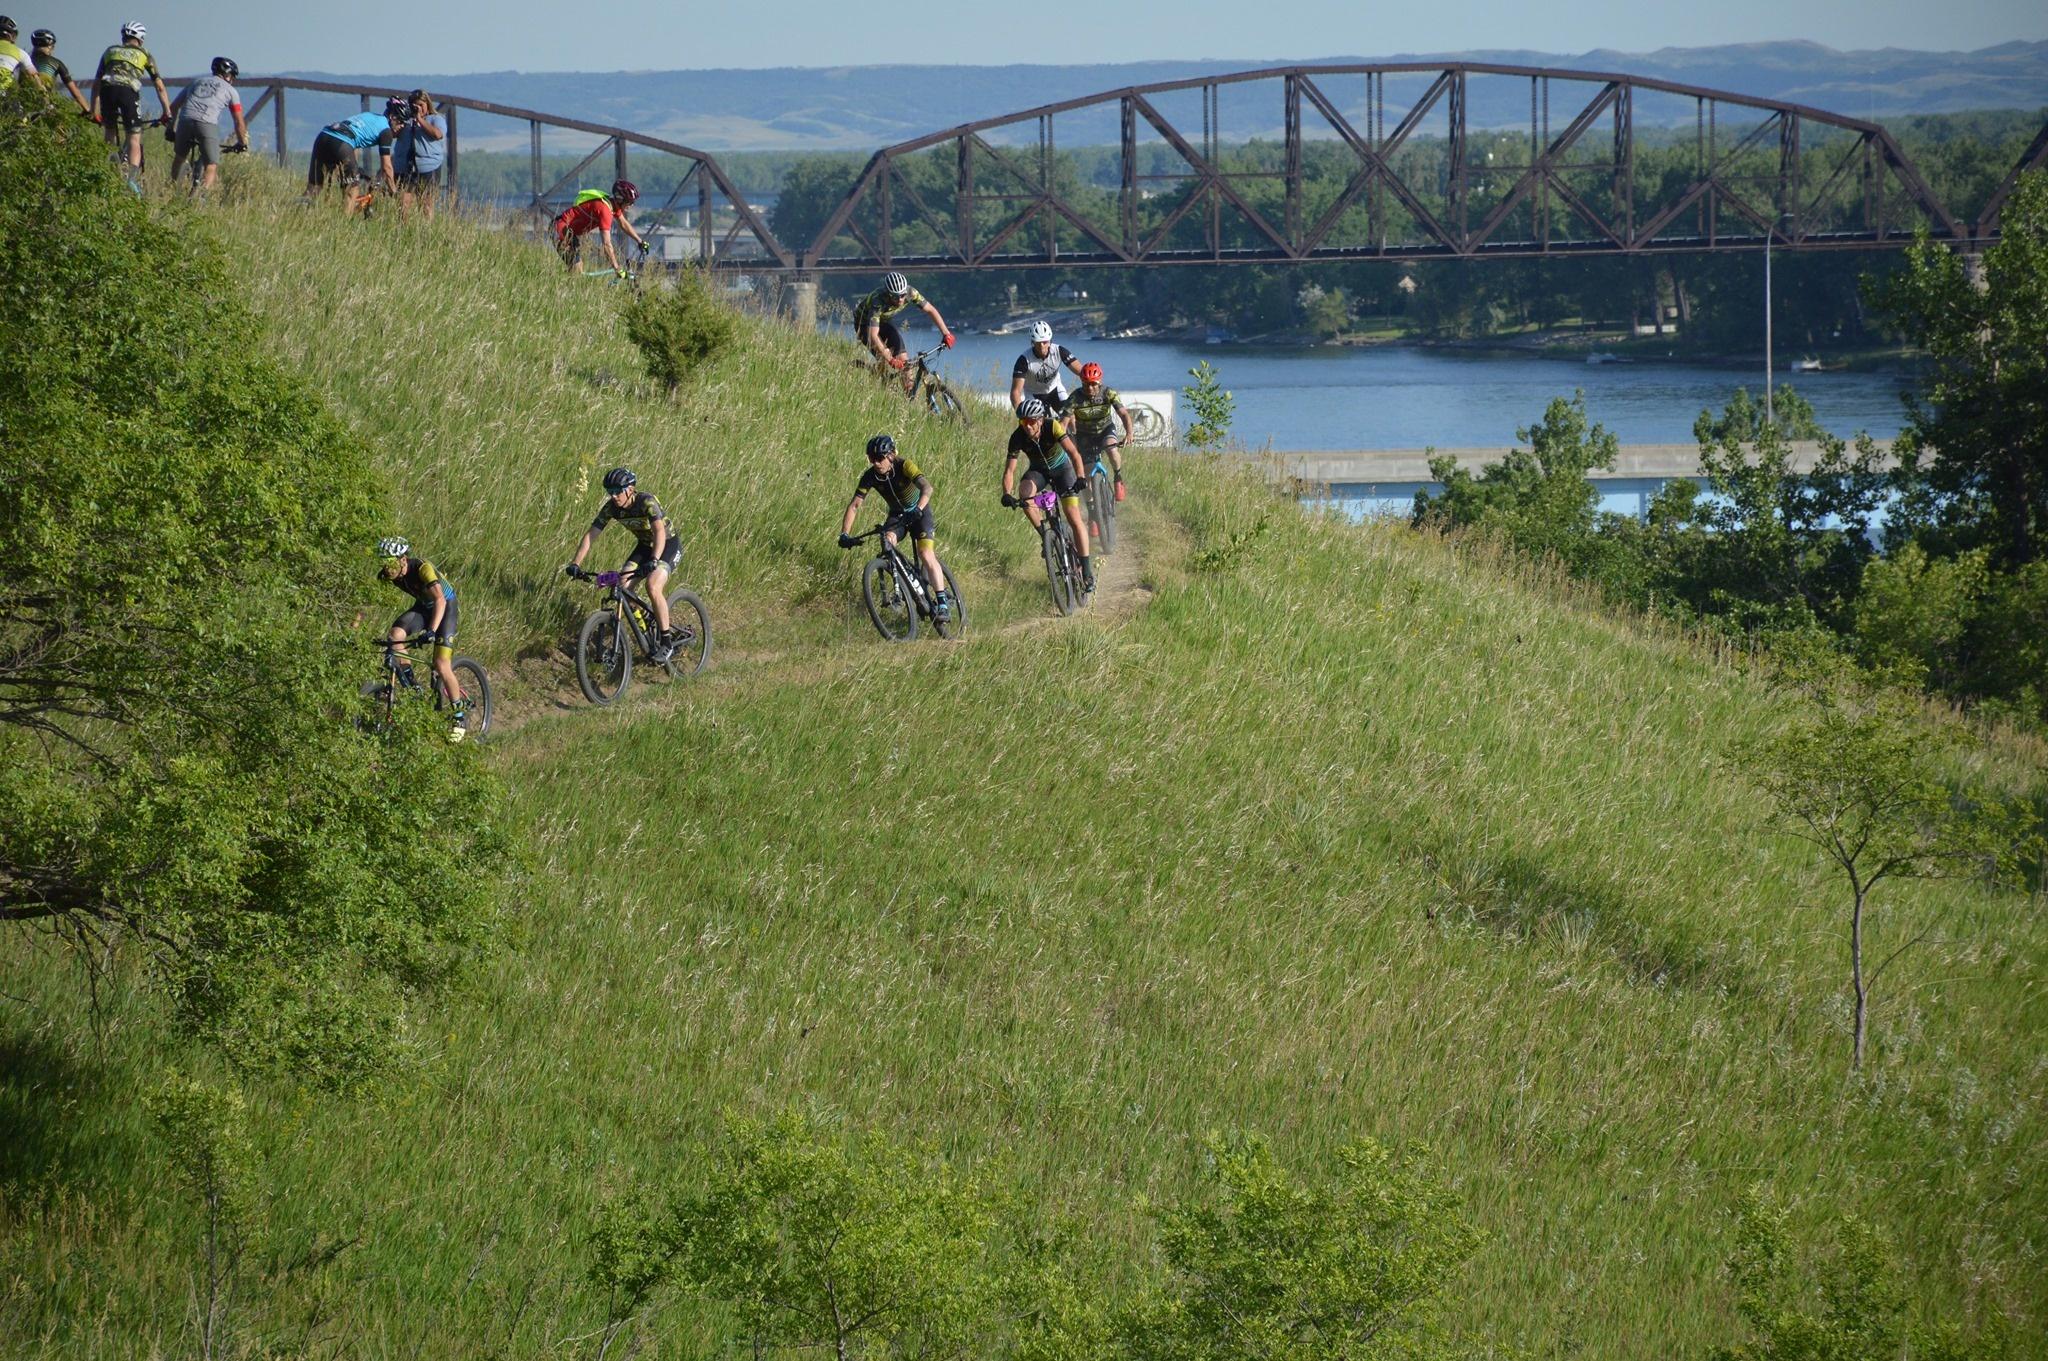 Pioneer Park Mountain Bike Trail (BSC)